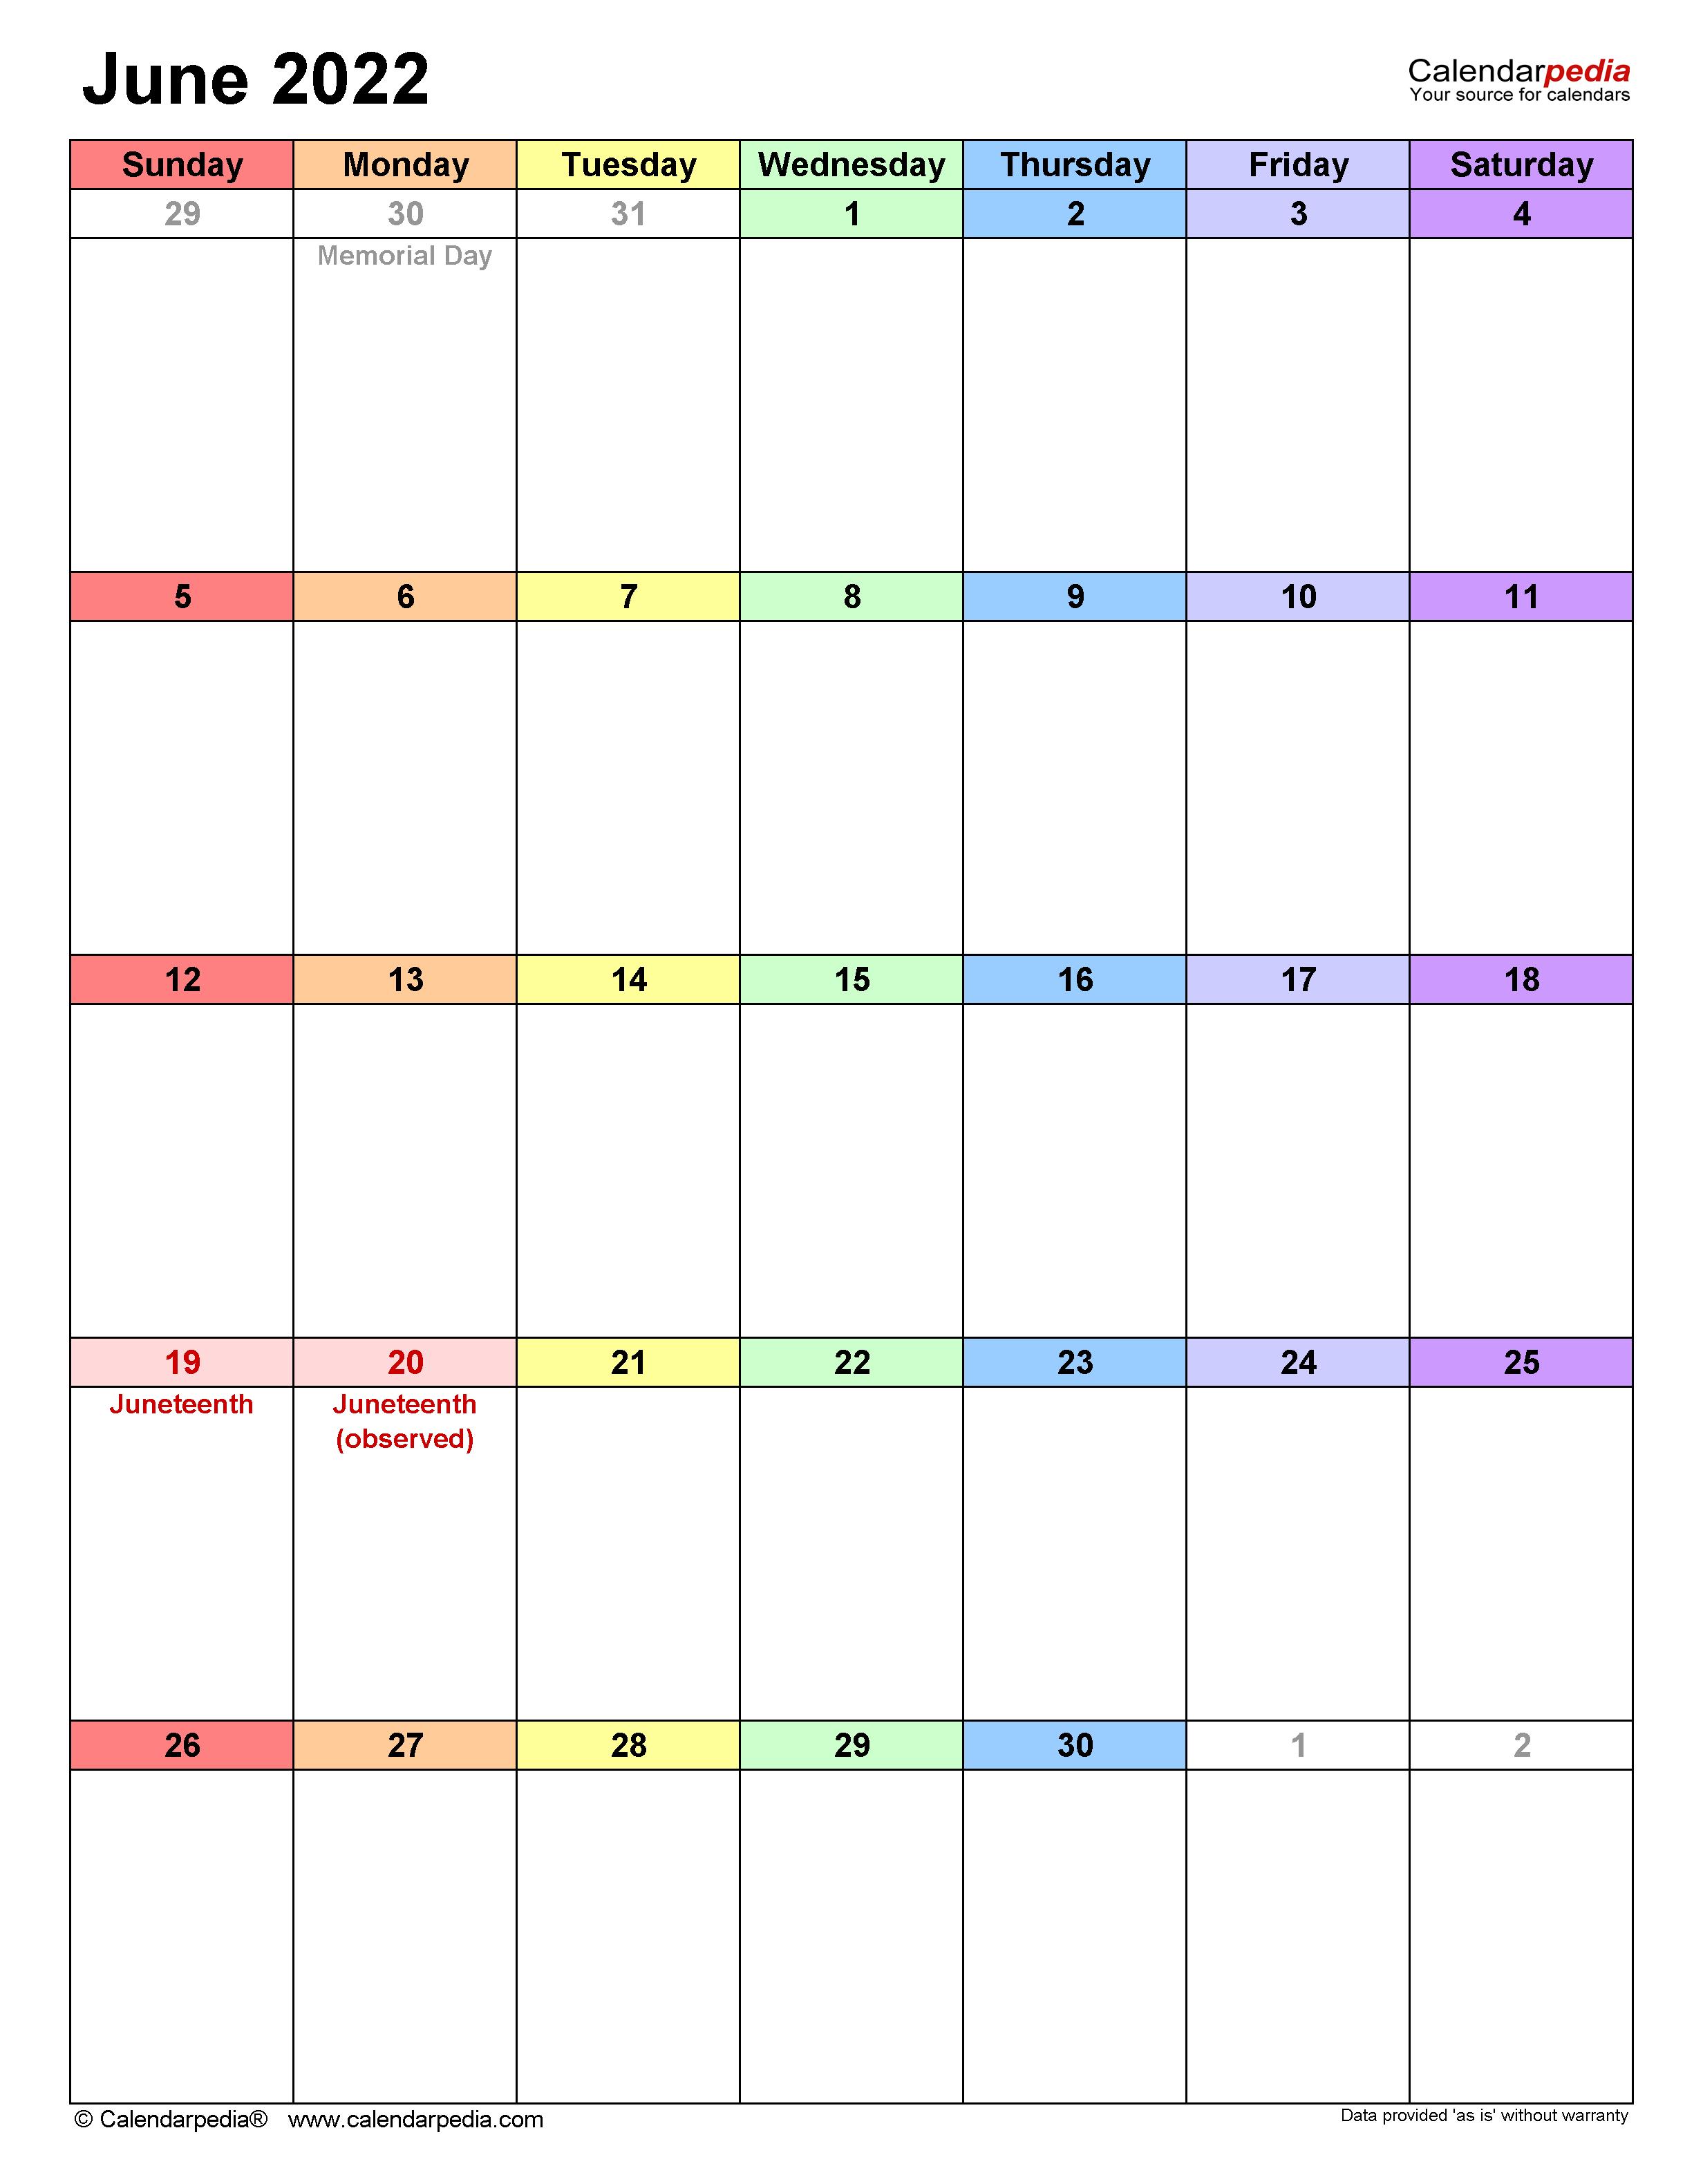 Printable Calendar For June 2022.June 2022 Calendar Templates For Word Excel And Pdf